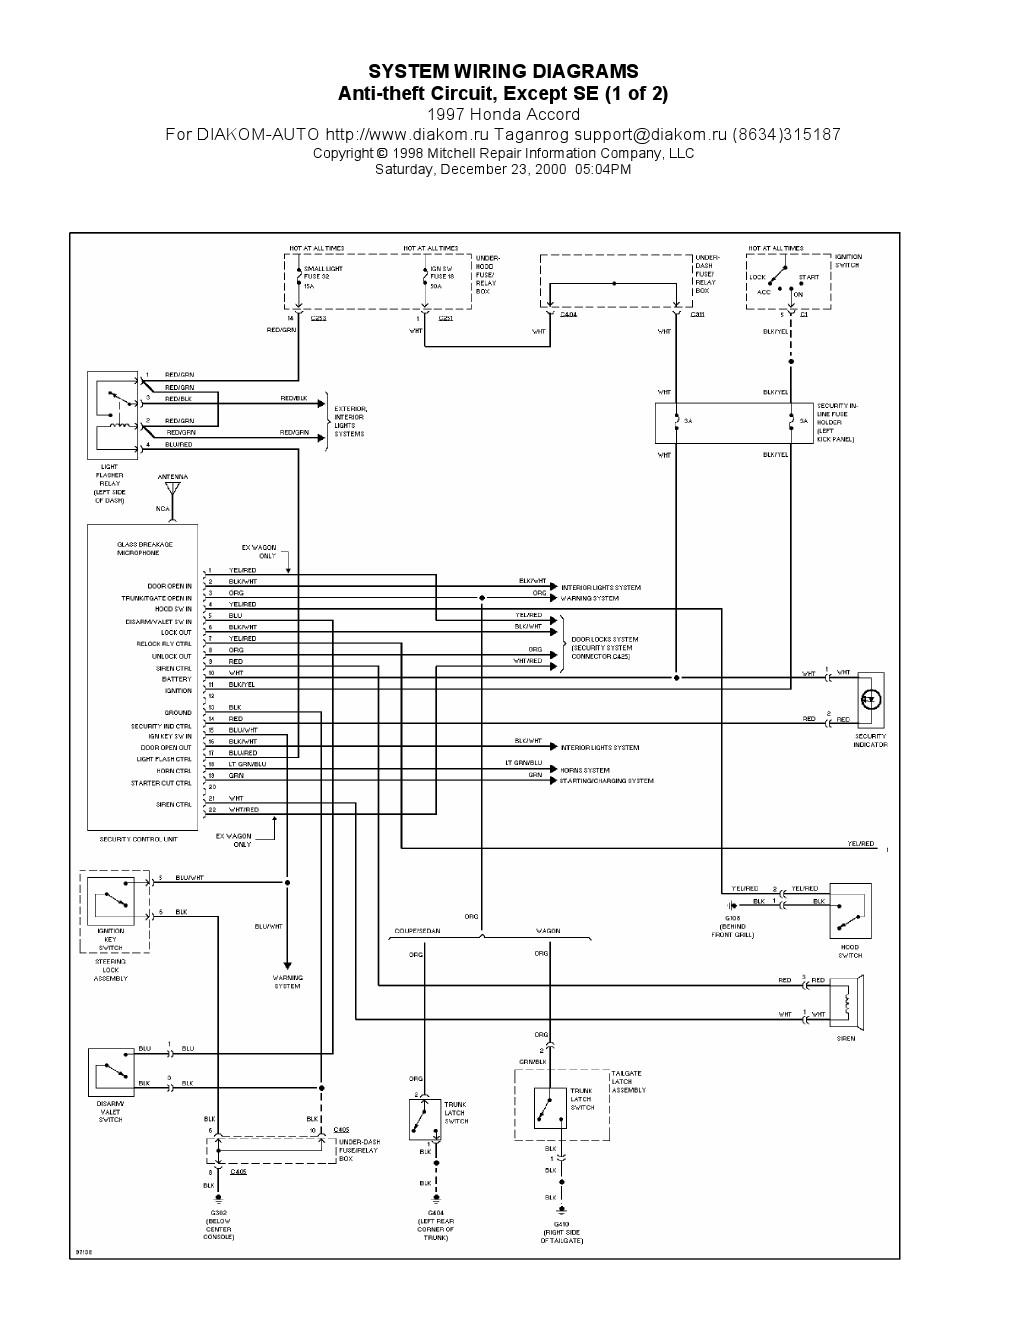 net1999 honda accord suspension system pics diagrams manual pdf net1999 honda accord suspension system pics diagrams manual pdf wiring diagram today